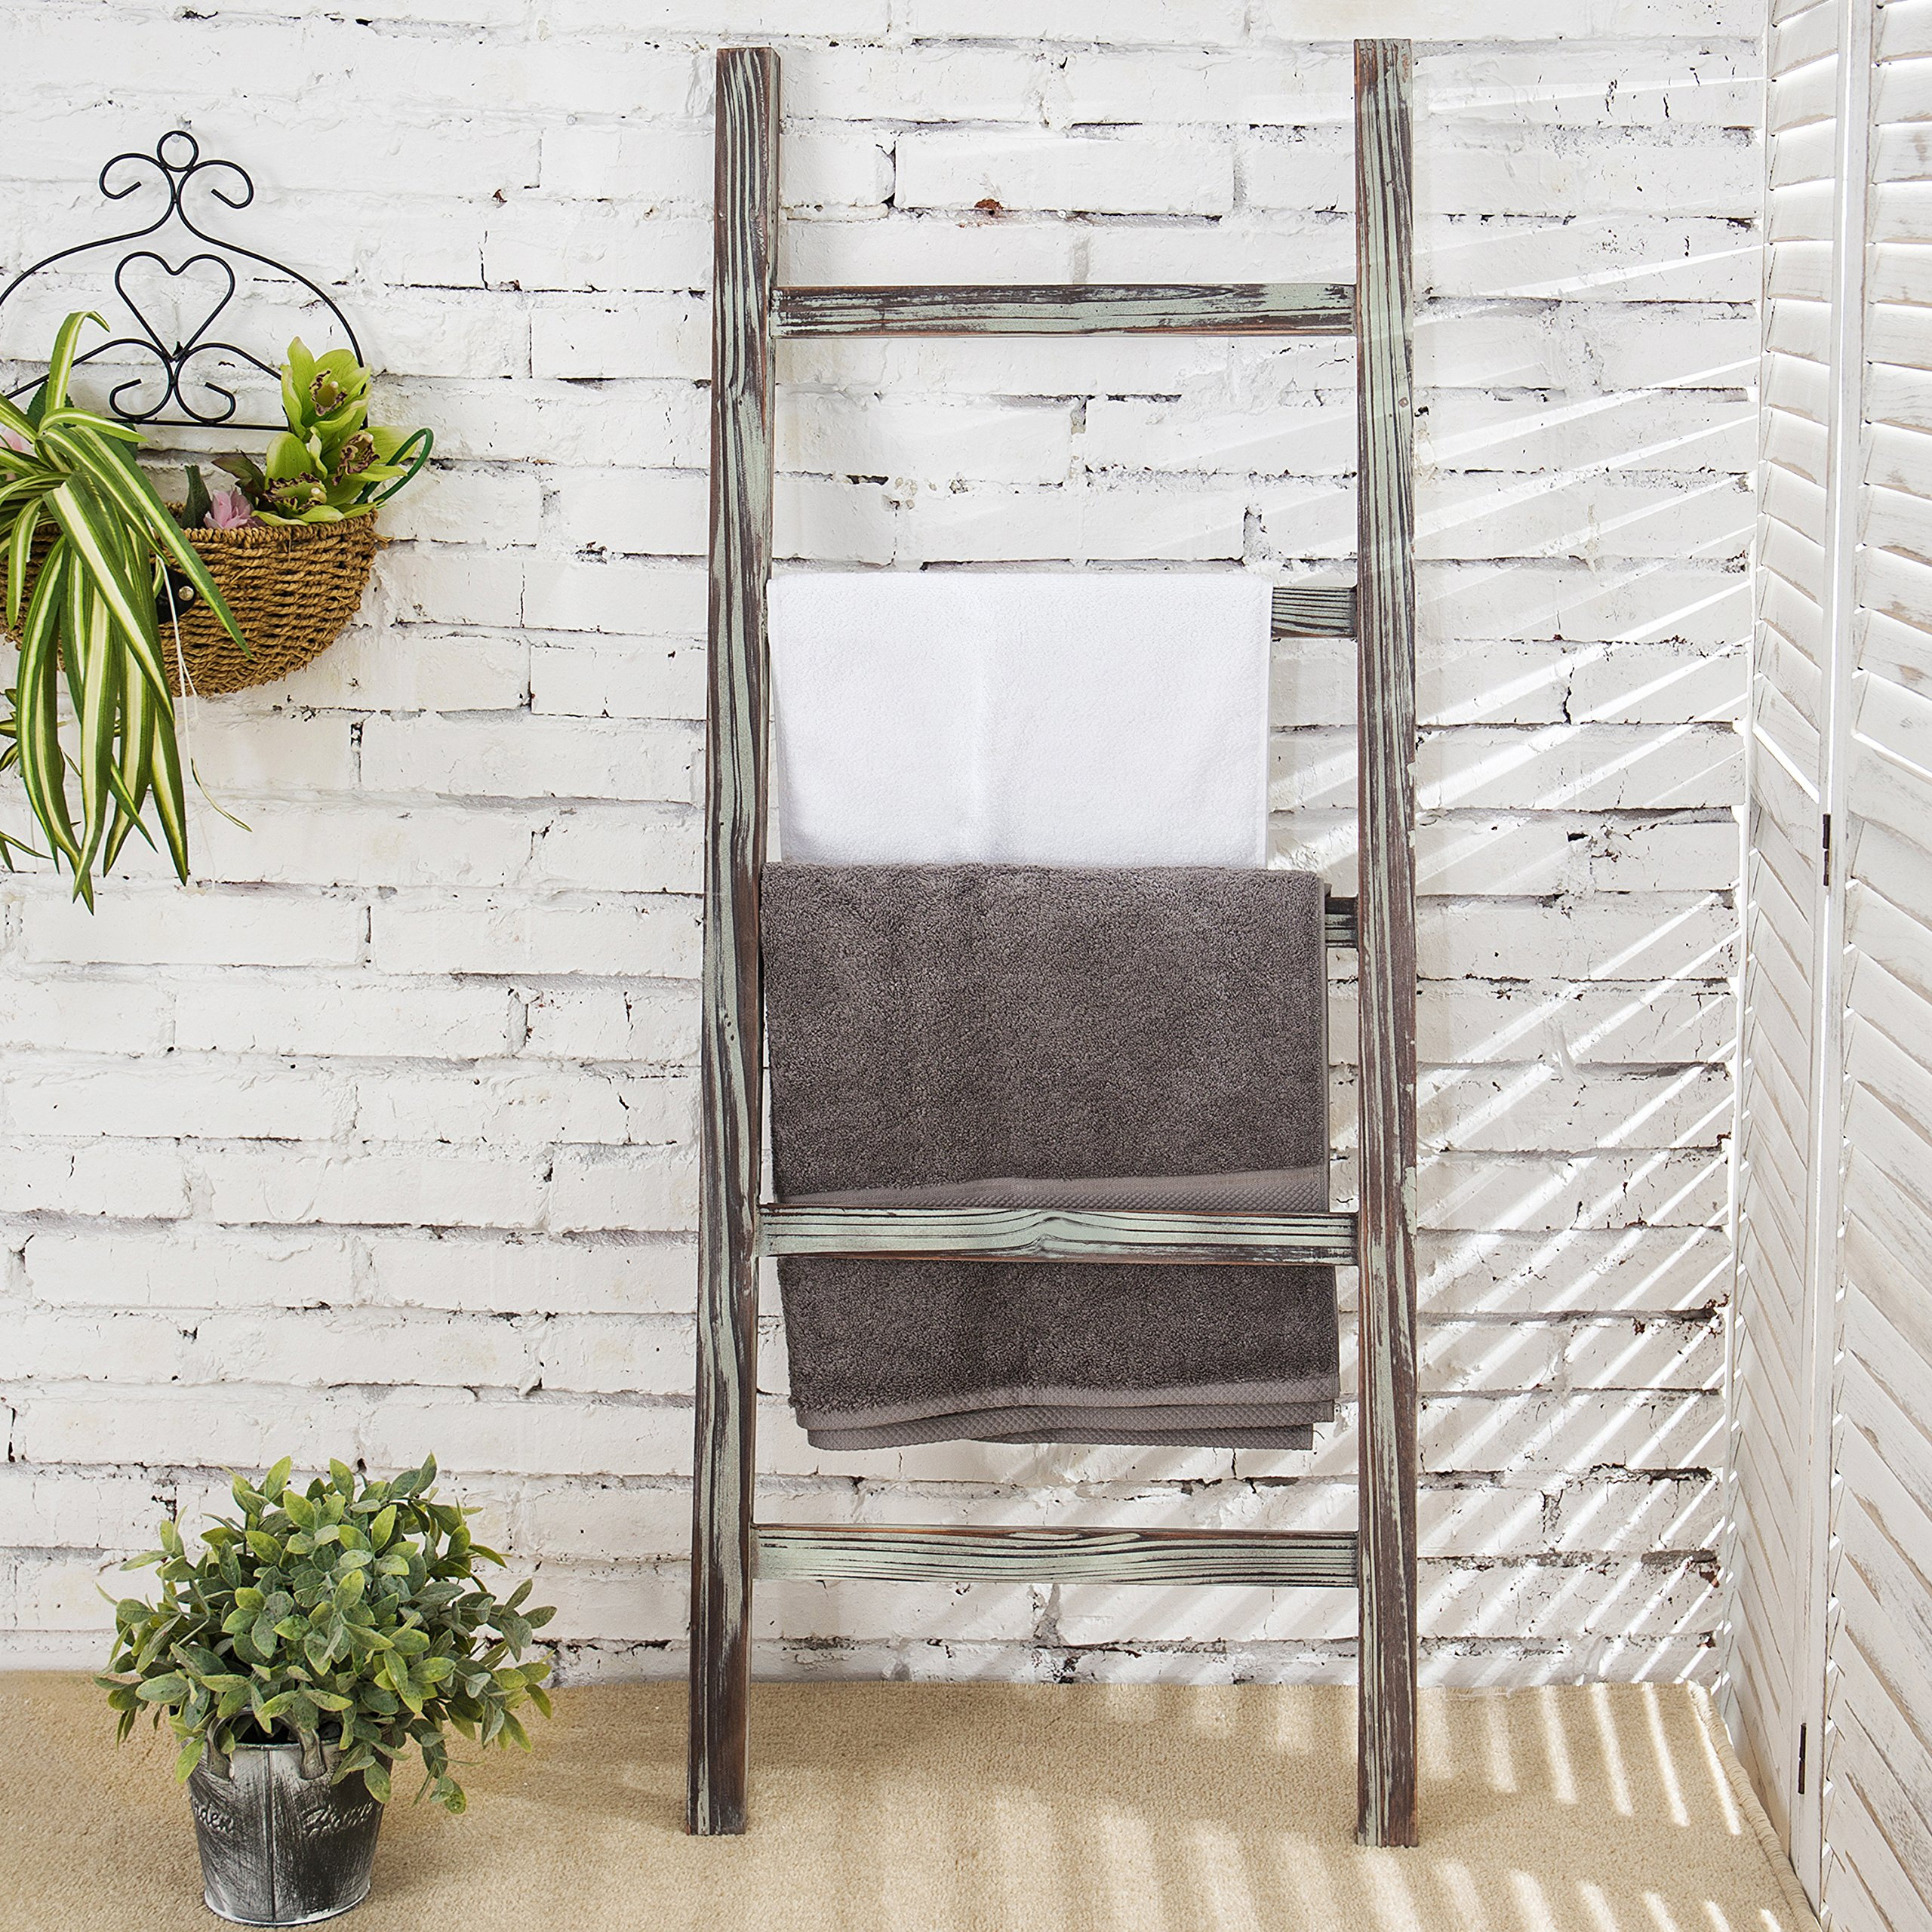 CDM product MyGift 4-Foot Decorative Rustic Barnwood 5-Rung Blanket Ladder Organizer, Hanging Bar Rack big image